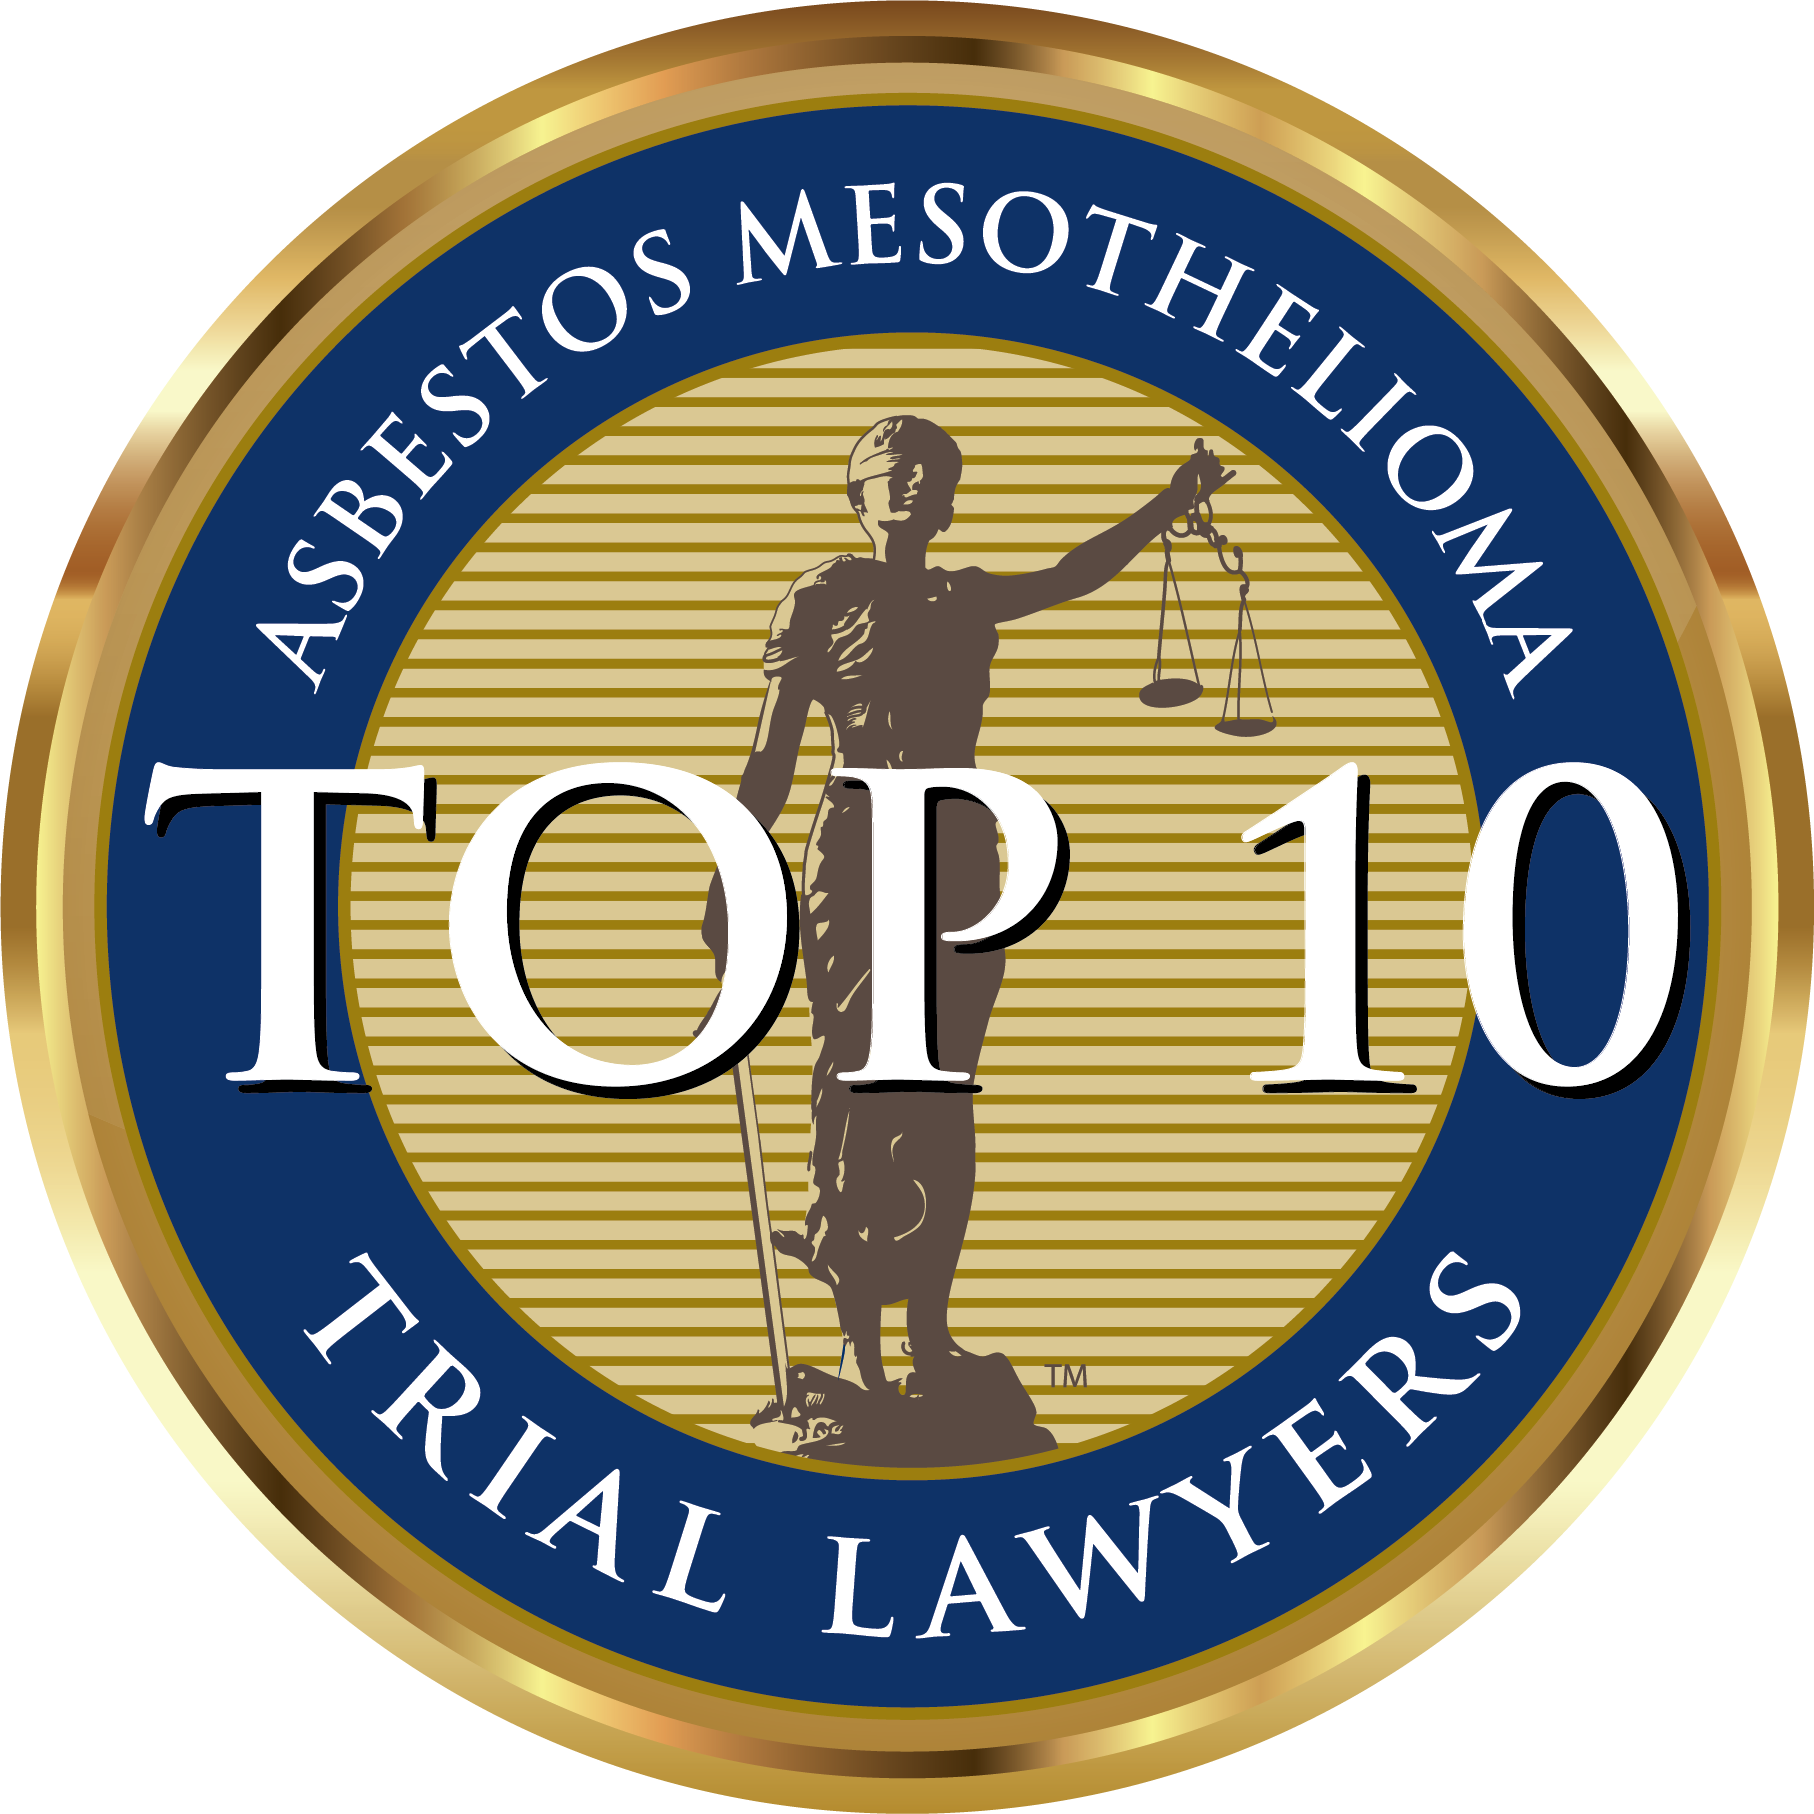 Asbestos Mesothelioma Trial Lawyers Top 10 Seal